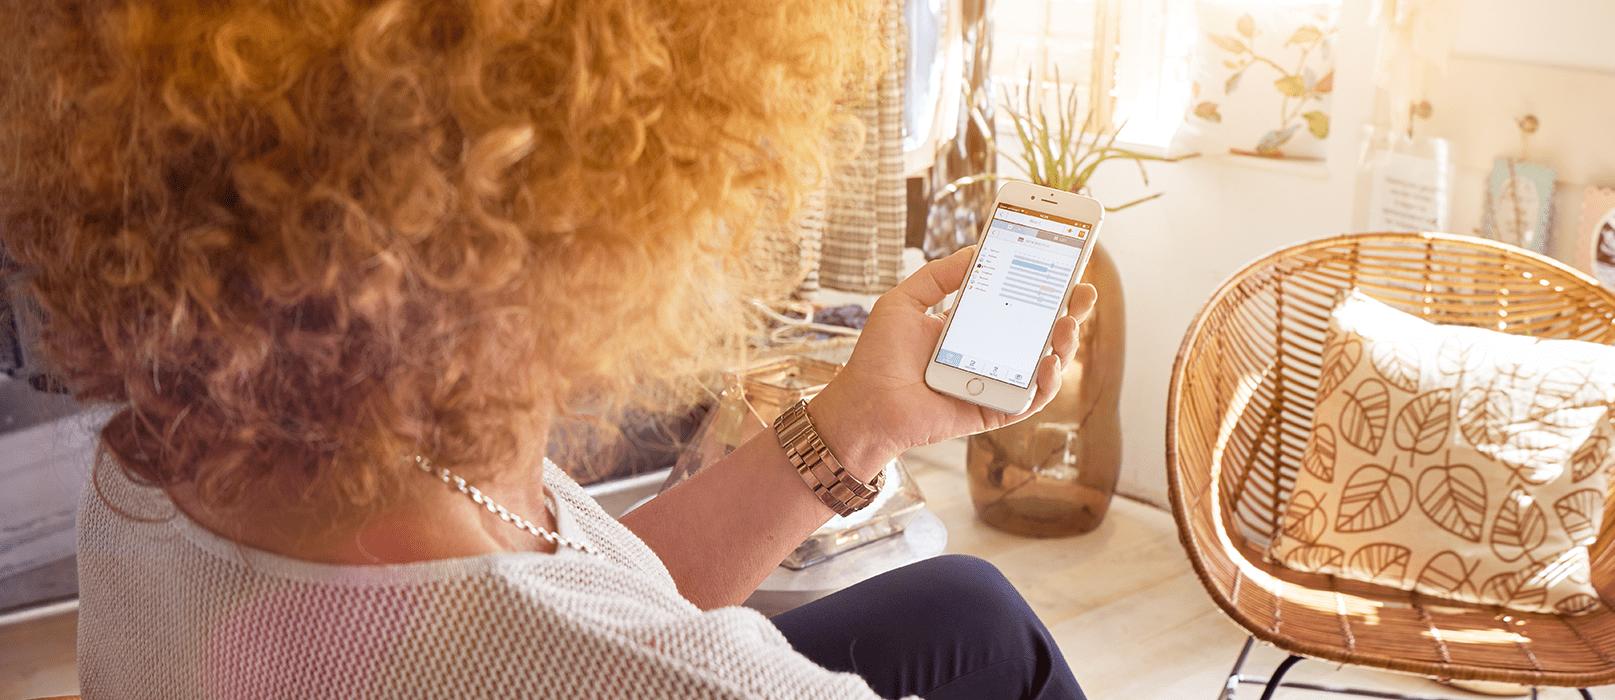 Mantelzorger checkt cAlarm Sense op haar smartphone